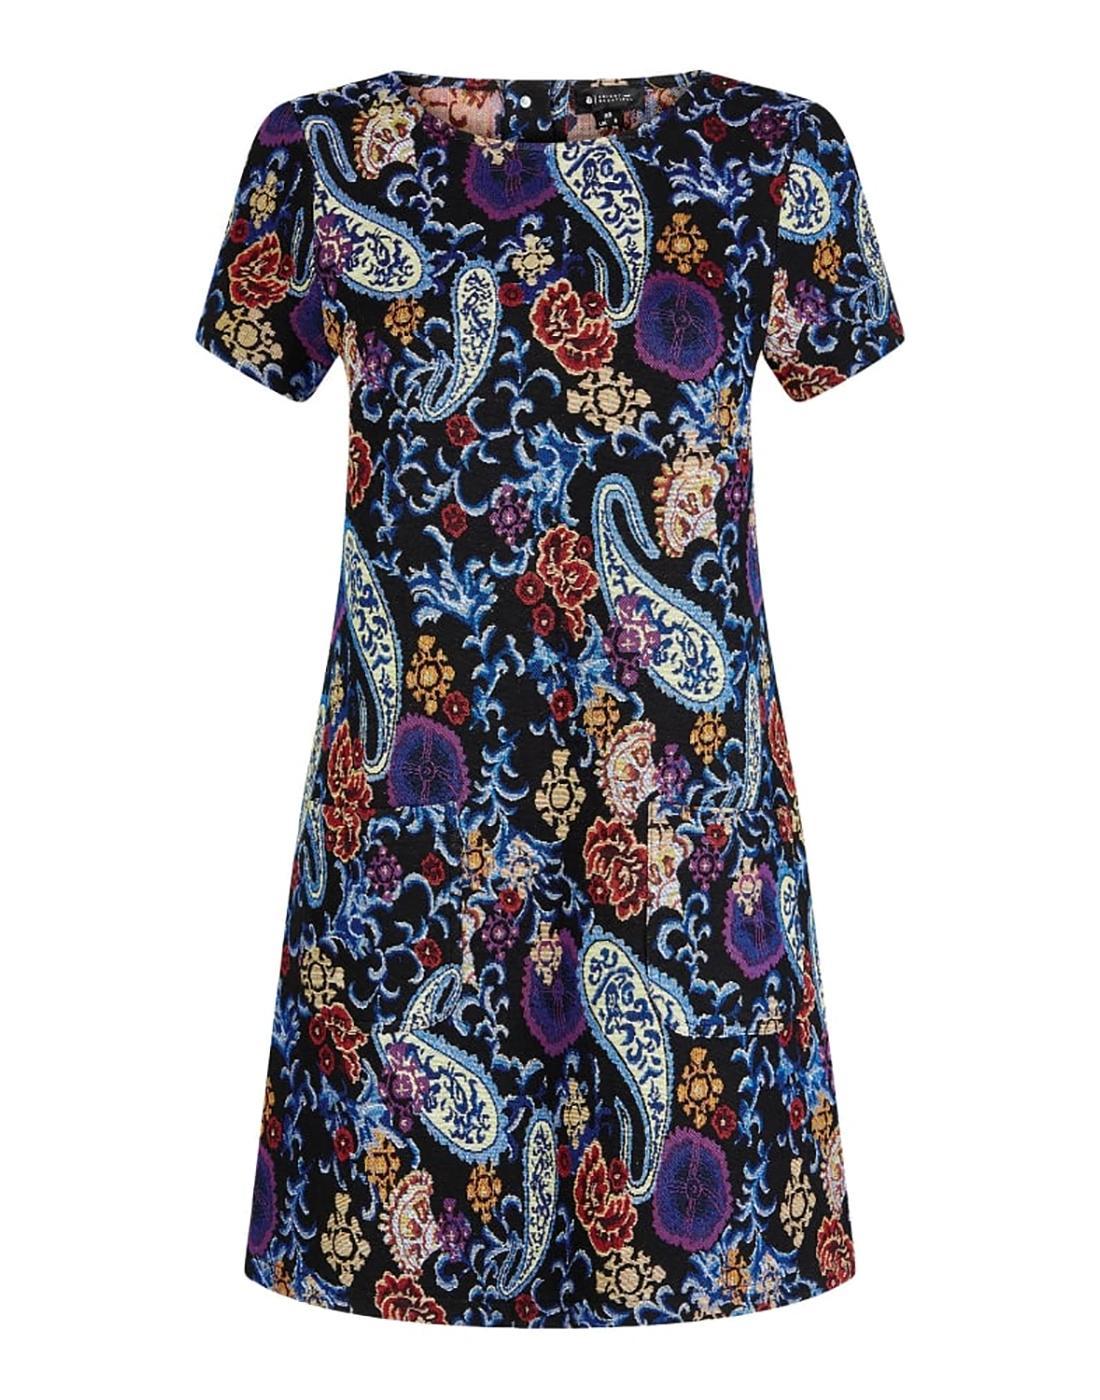 Ella BRIGHT & BEAUTIFUL Retro Paisley Mod Dress